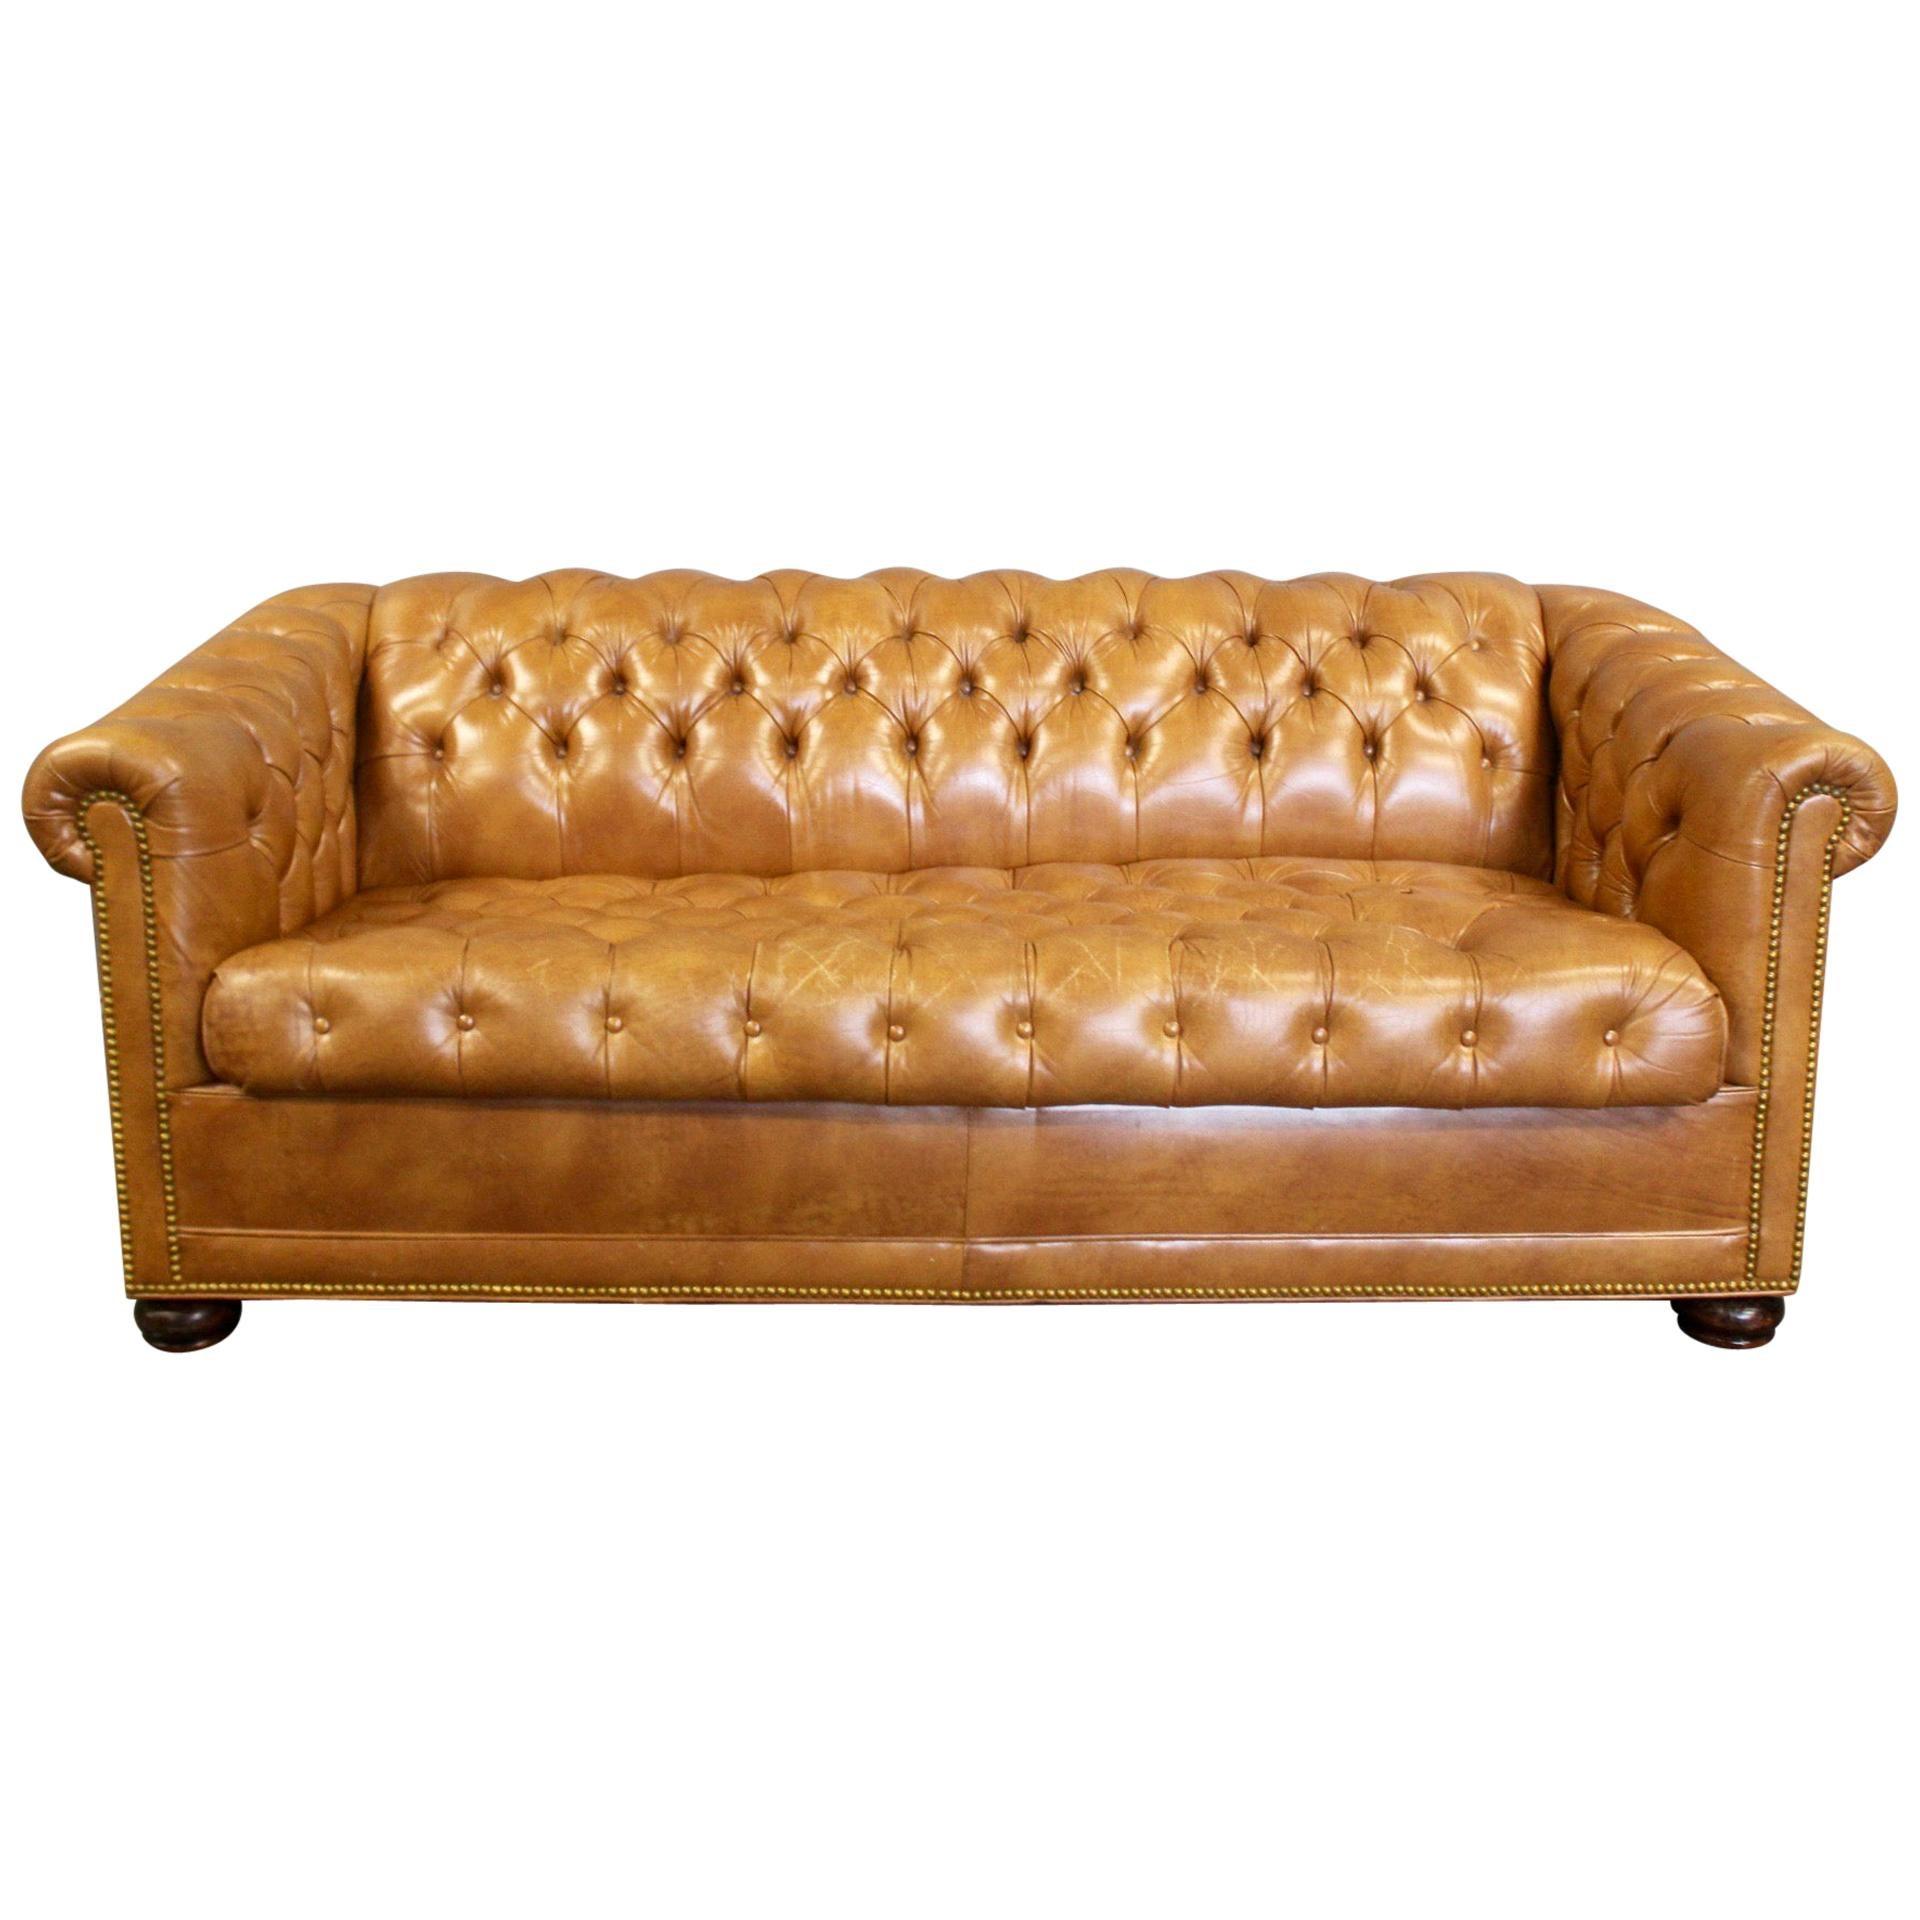 Superieur English Leather Chesterfield Sleeper Sofa Brass Nailheads